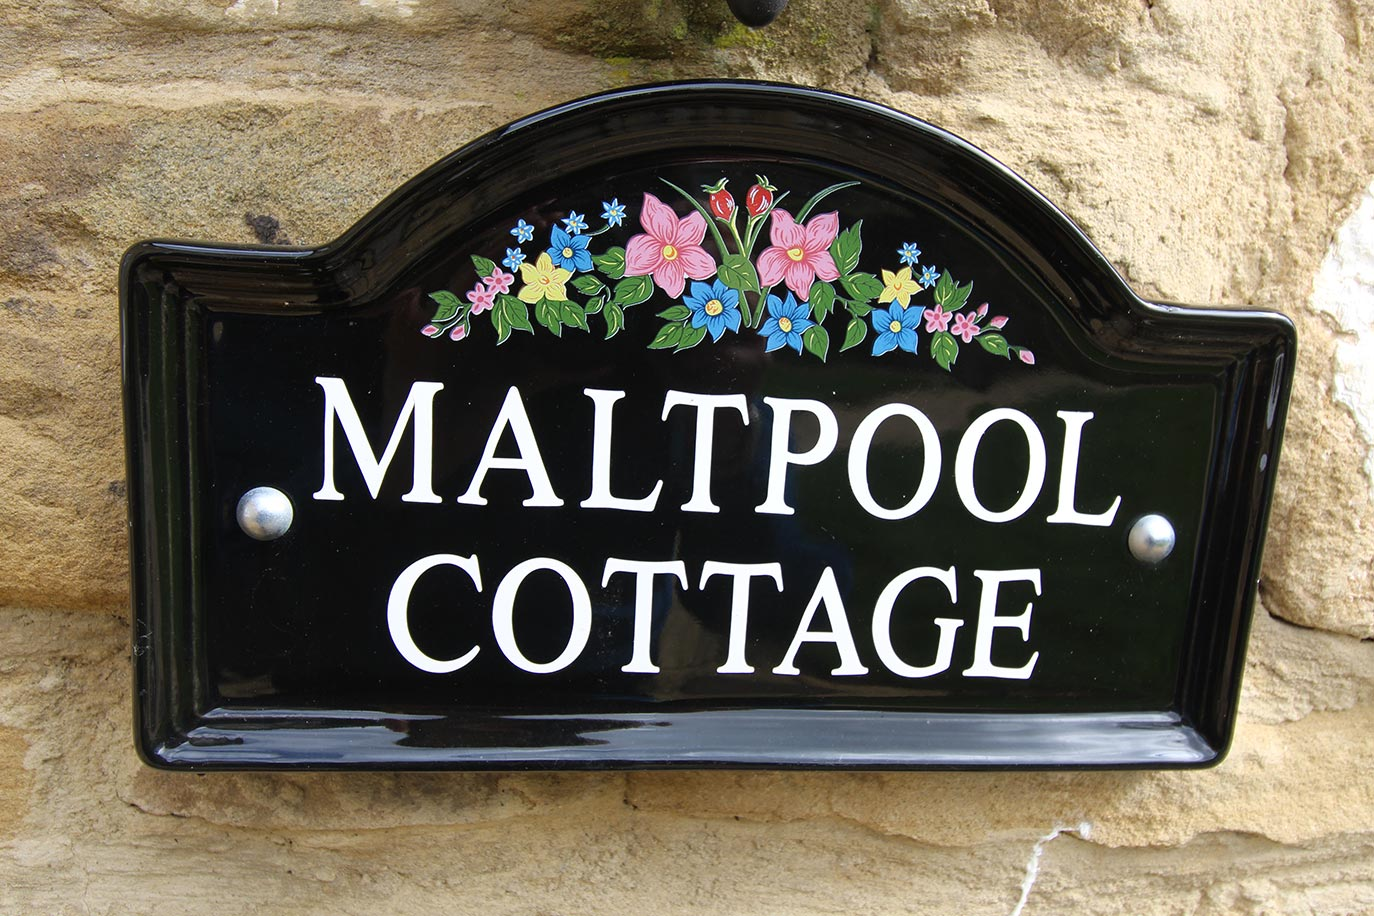 1-Maltpool-Cottage-copy